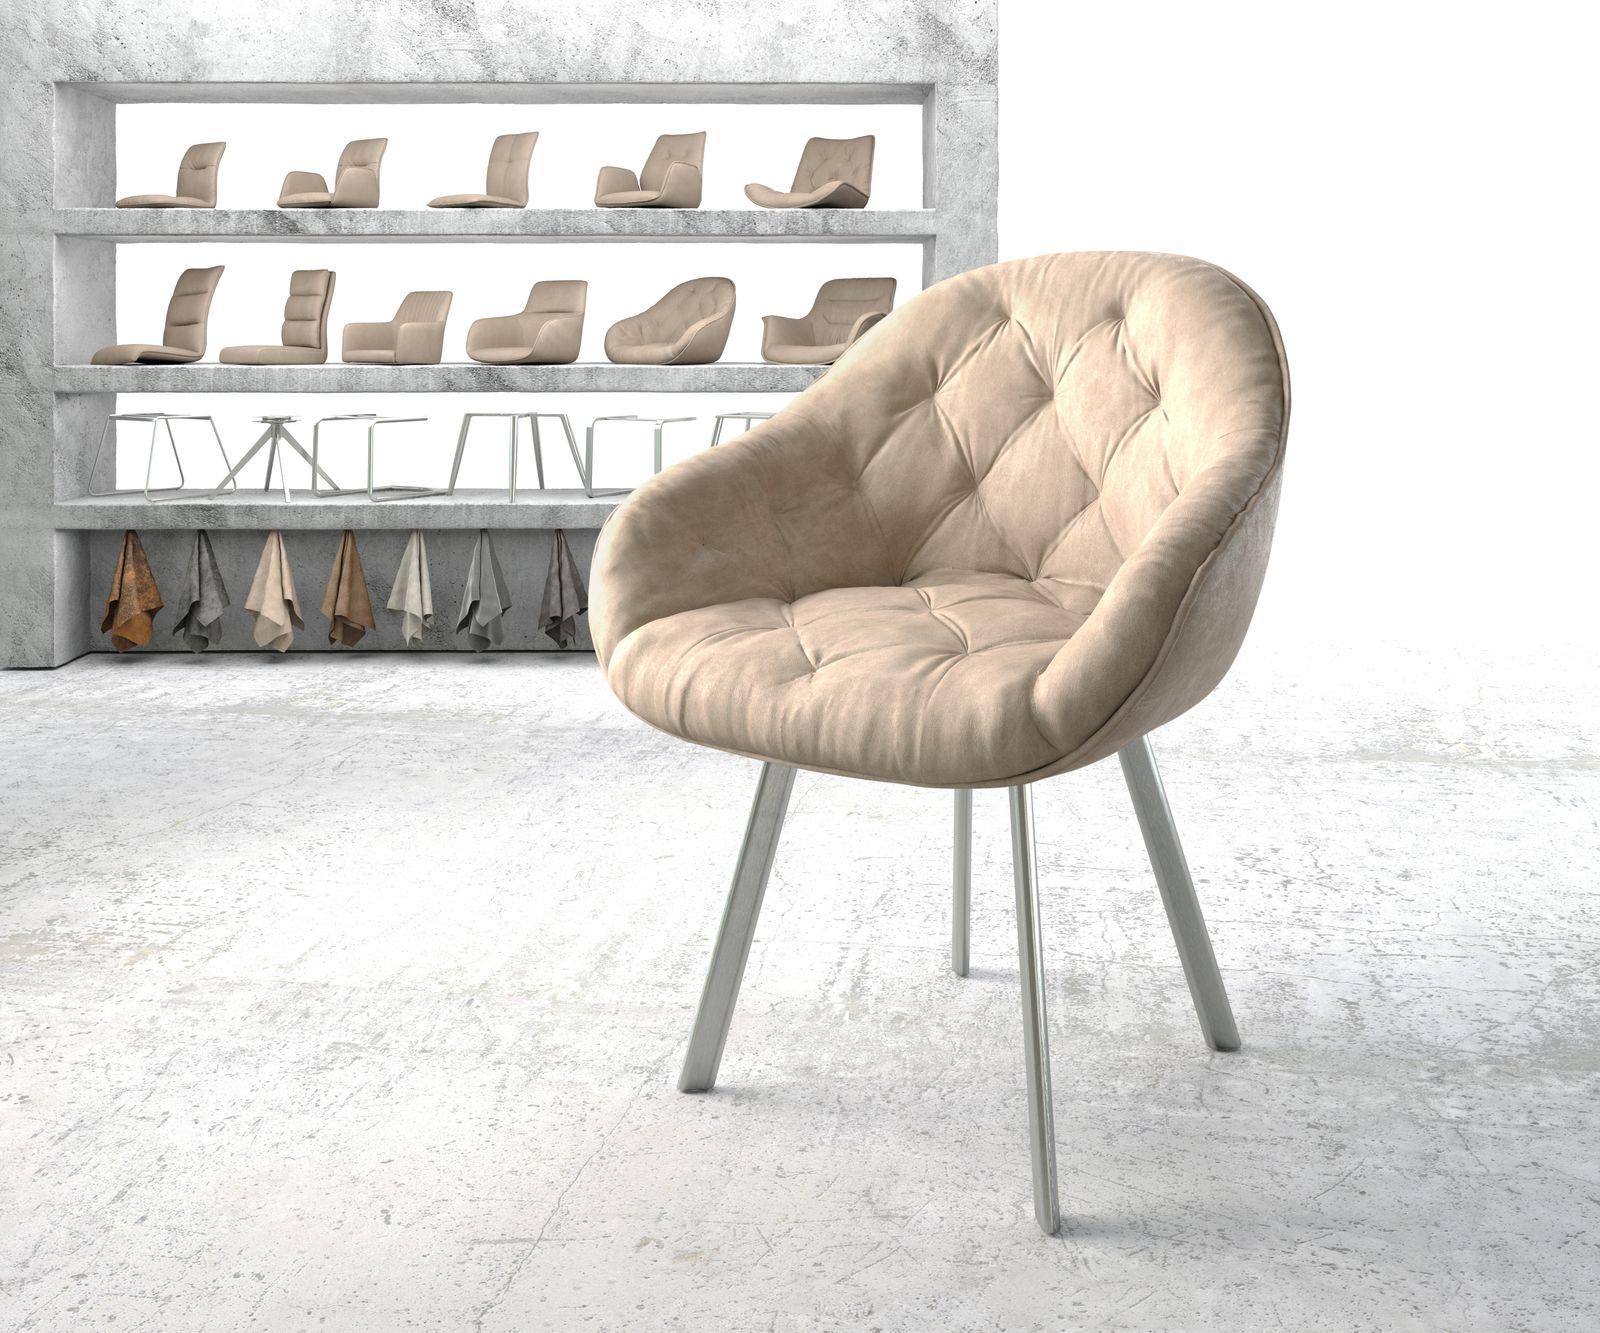 delife-armlehnstuhl-gaio-flex-beige-vintage-4-fu-oval-edelstahl-esszimmerstuhle